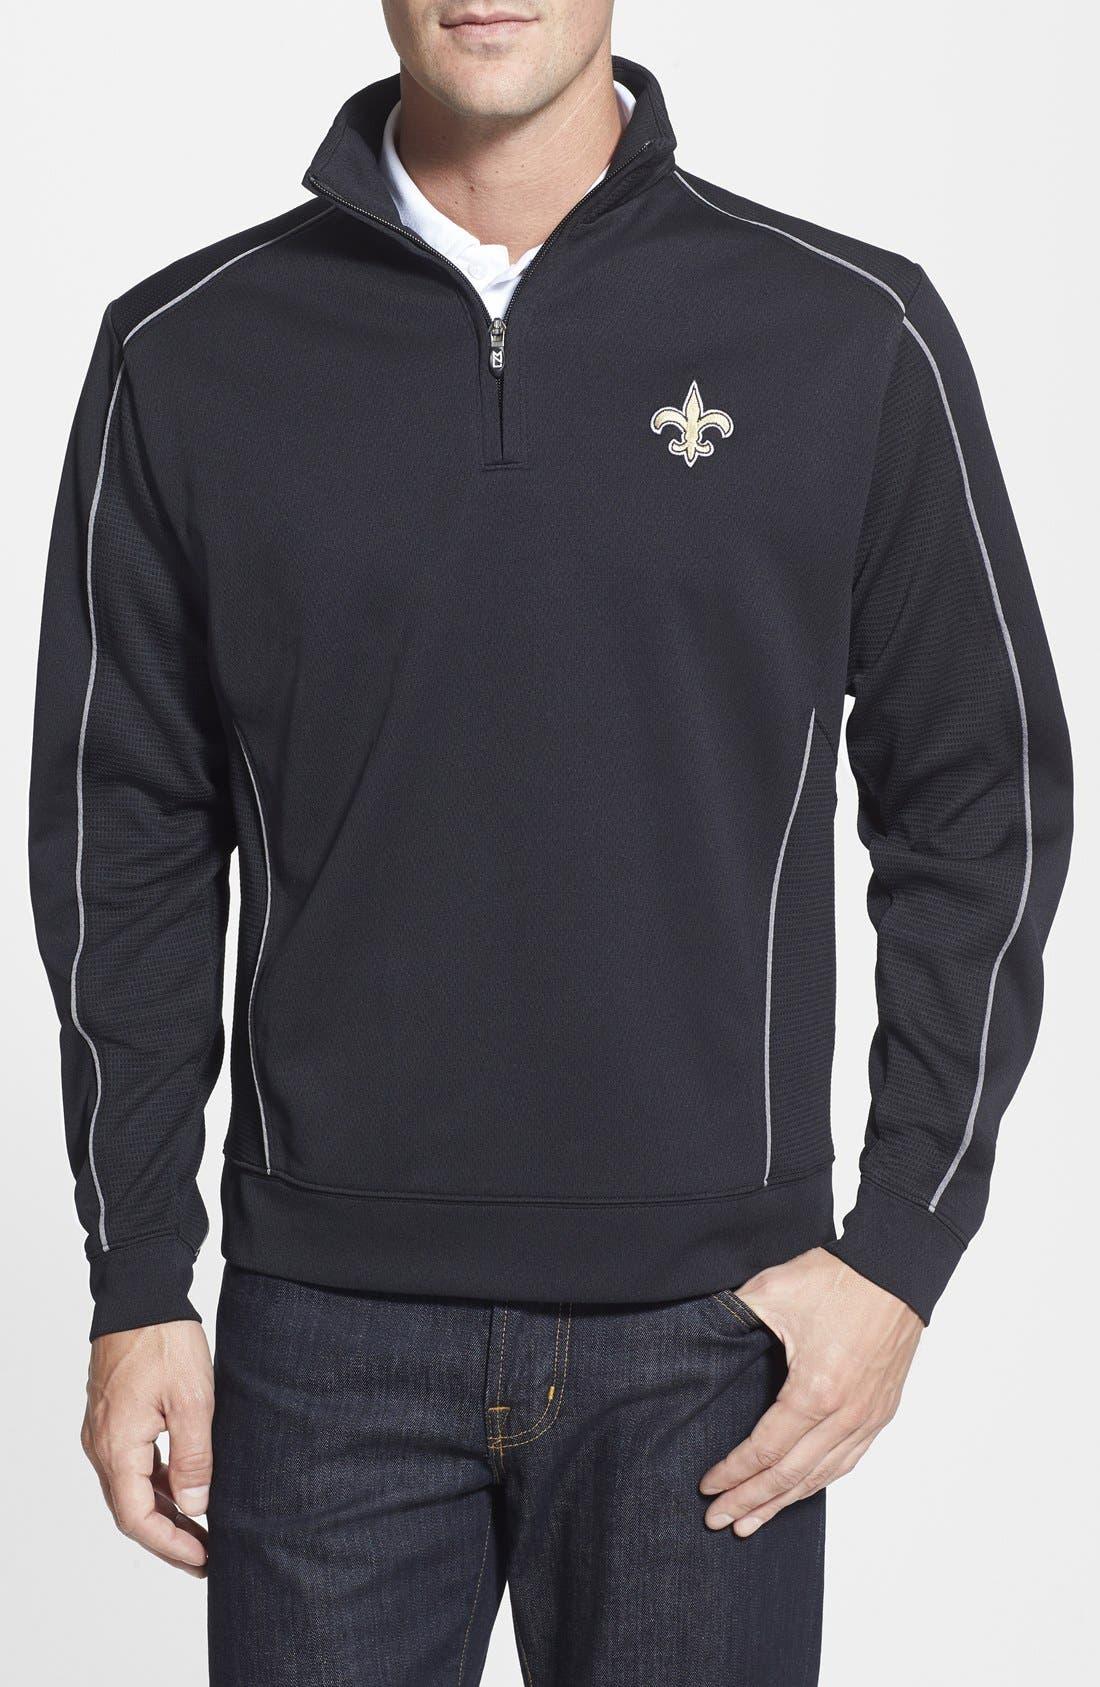 New Orleans Saints - Edge DryTec Moisture Wicking Half Zip Pullover,                             Main thumbnail 1, color,                             001